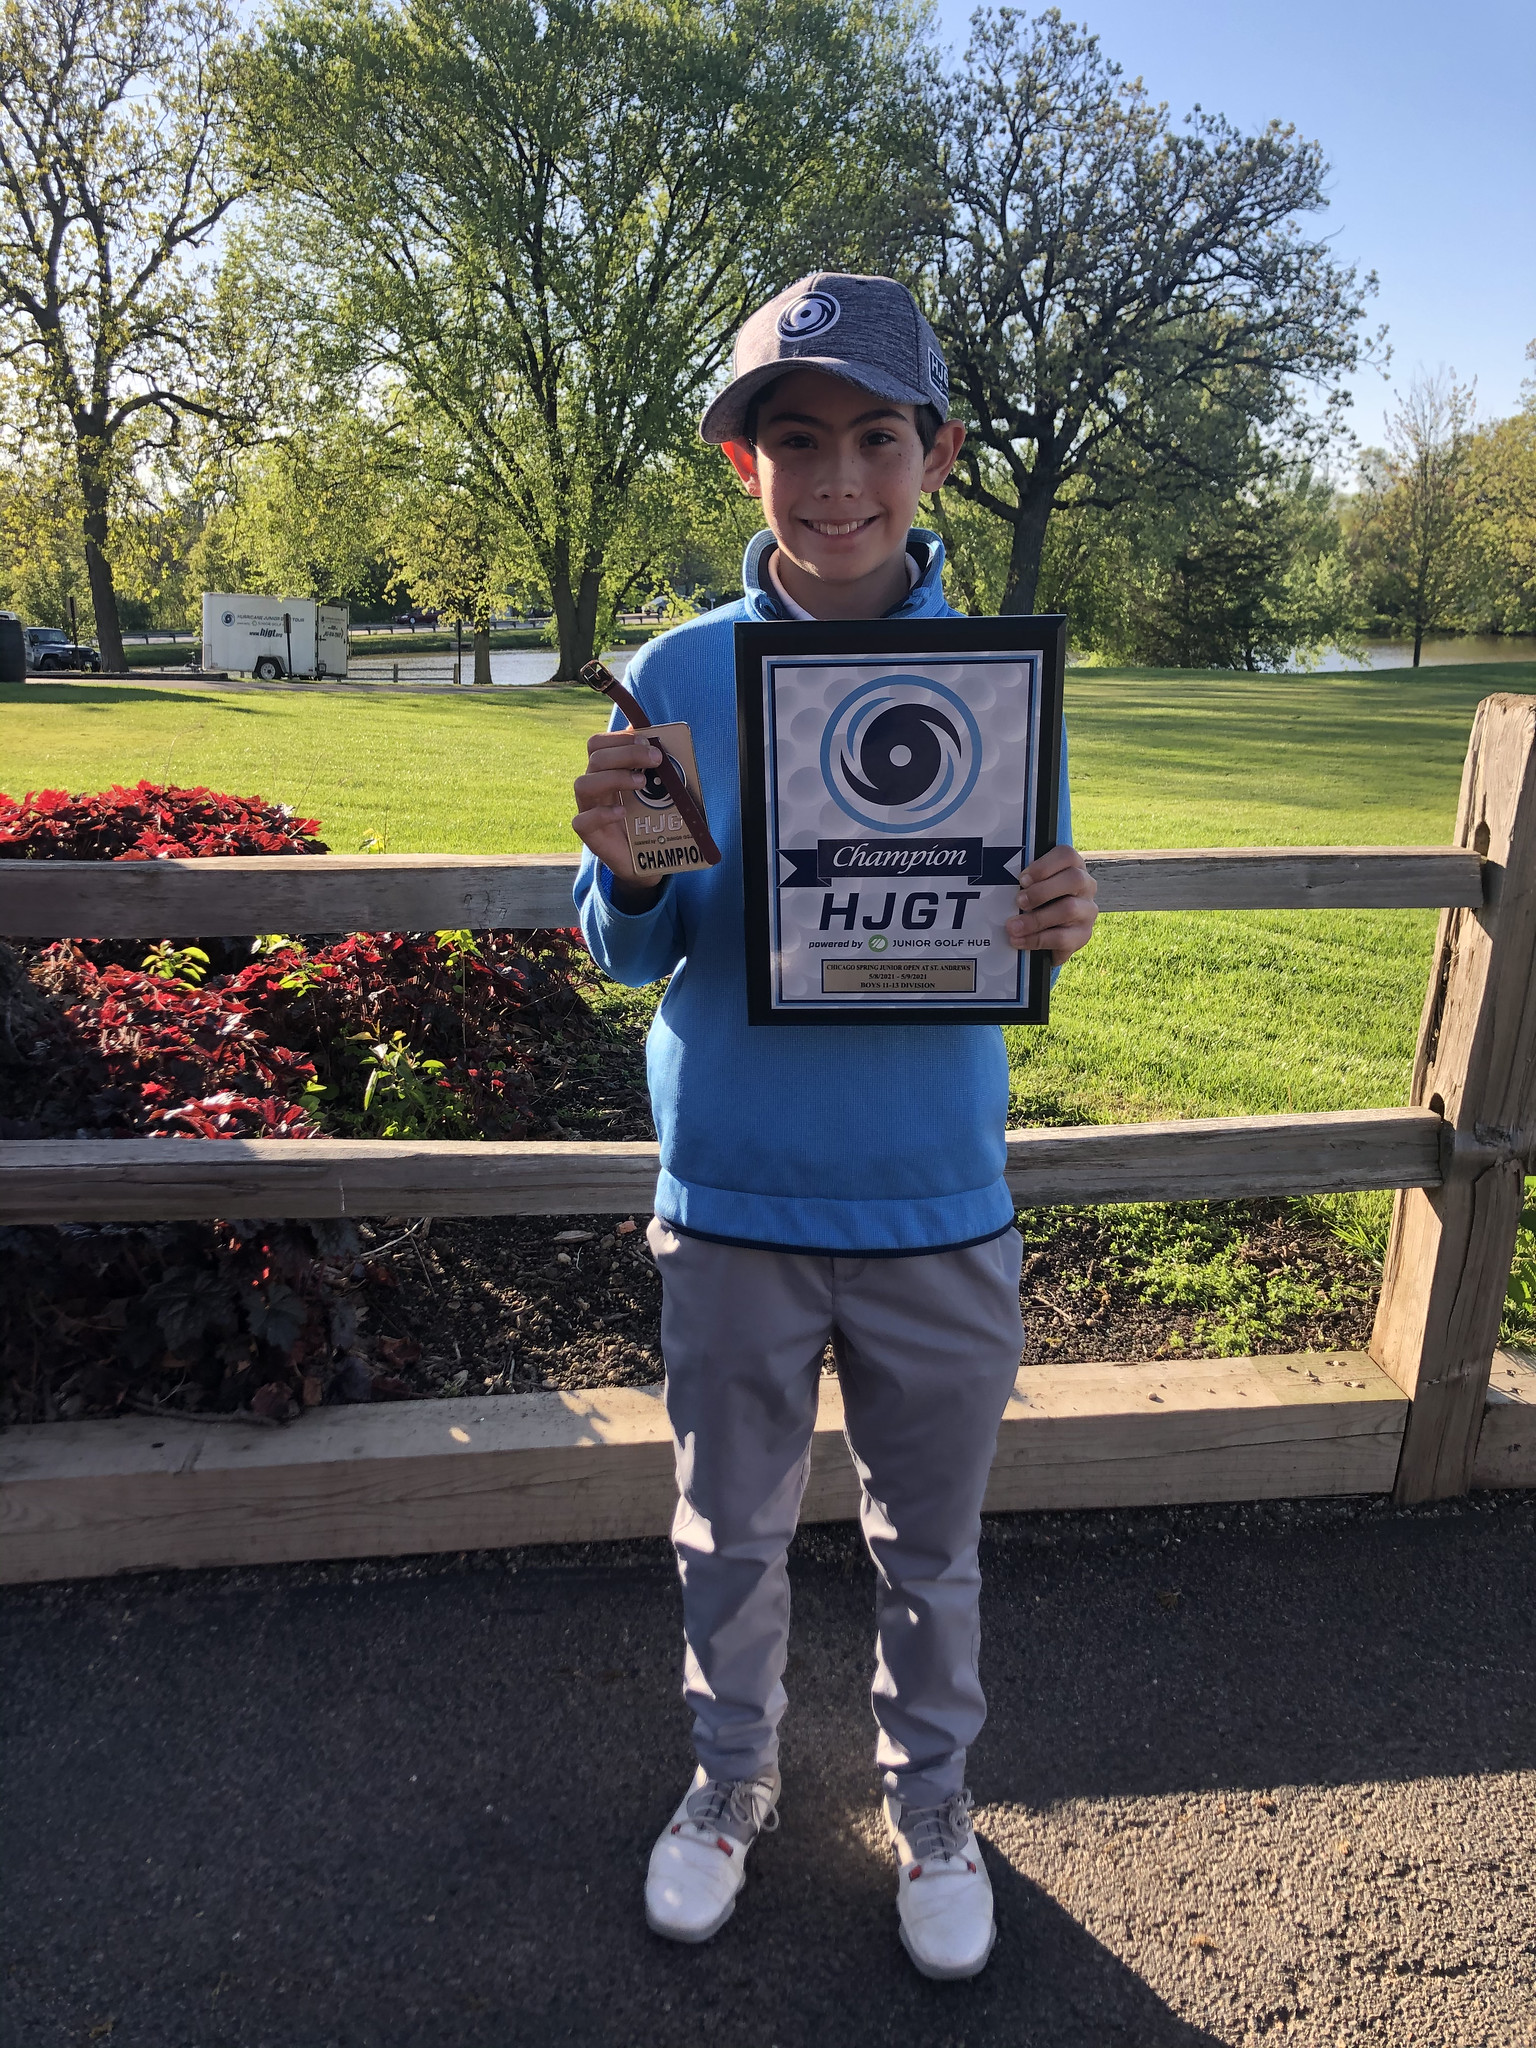 Chicago Spring Junior Open at St. Andrews